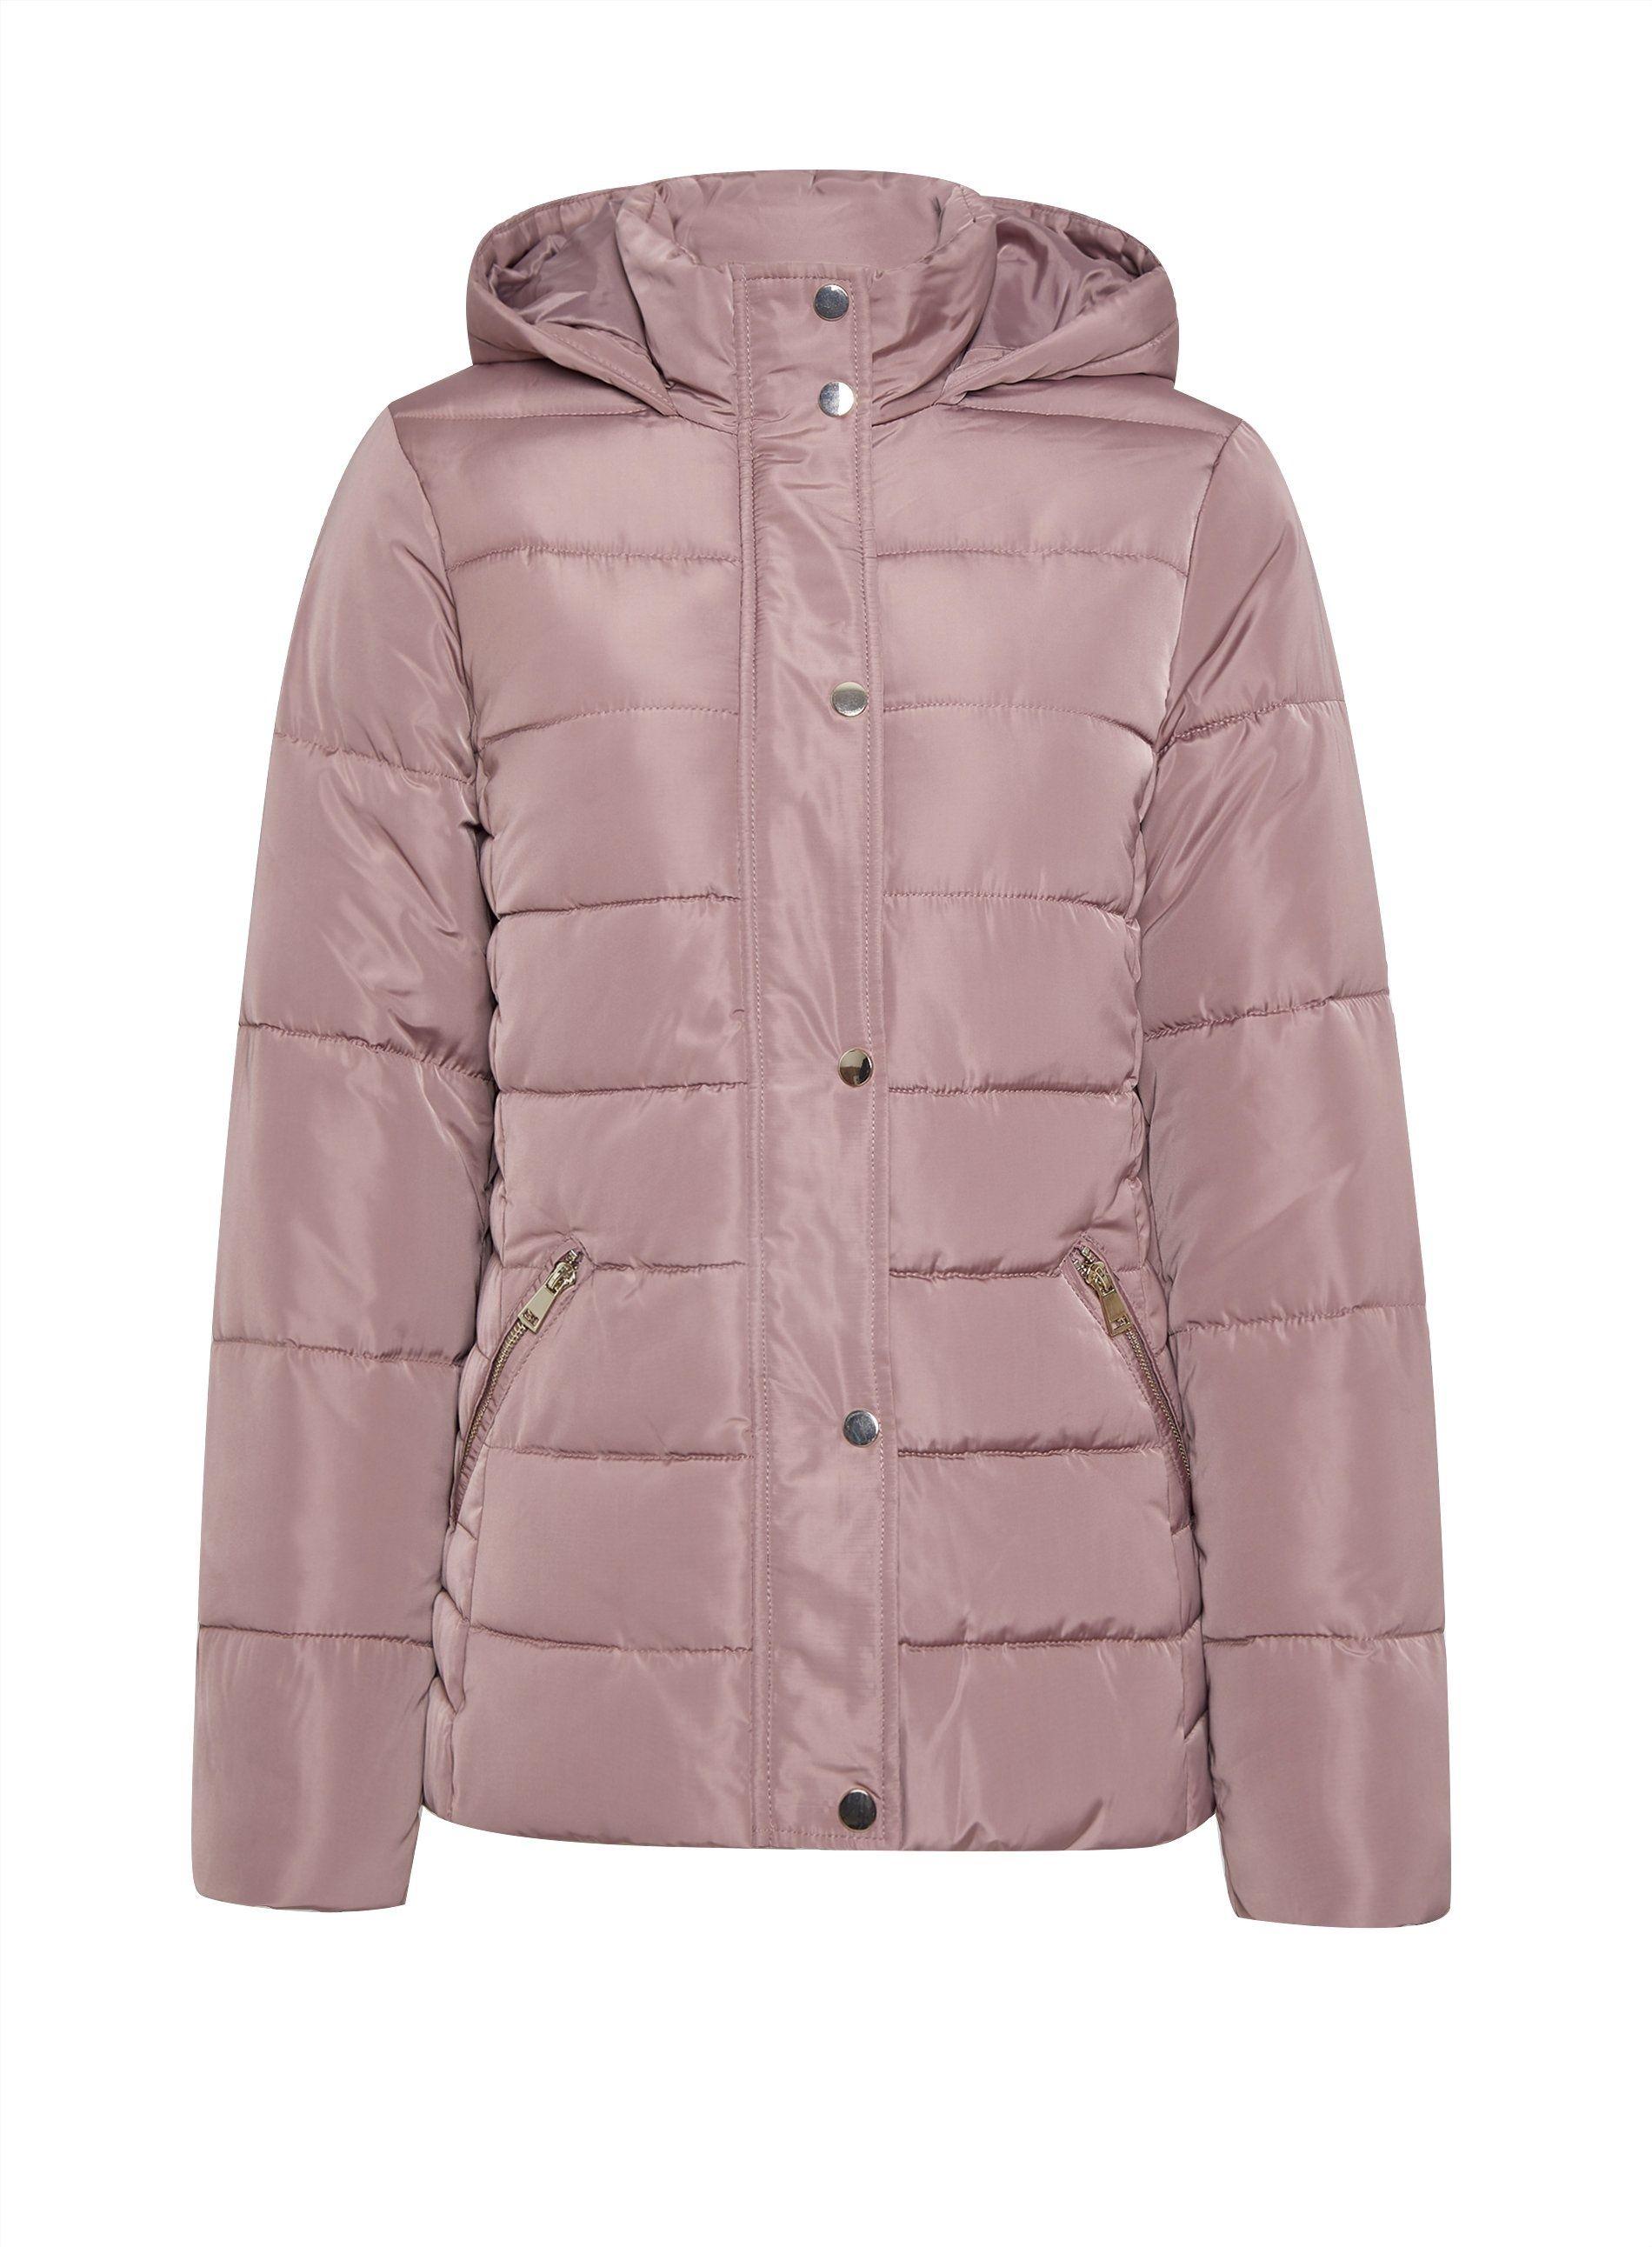 Dorothy Perkins Womens Blush Short Padded Coat Jacket Winter Warm Zip Outerwear